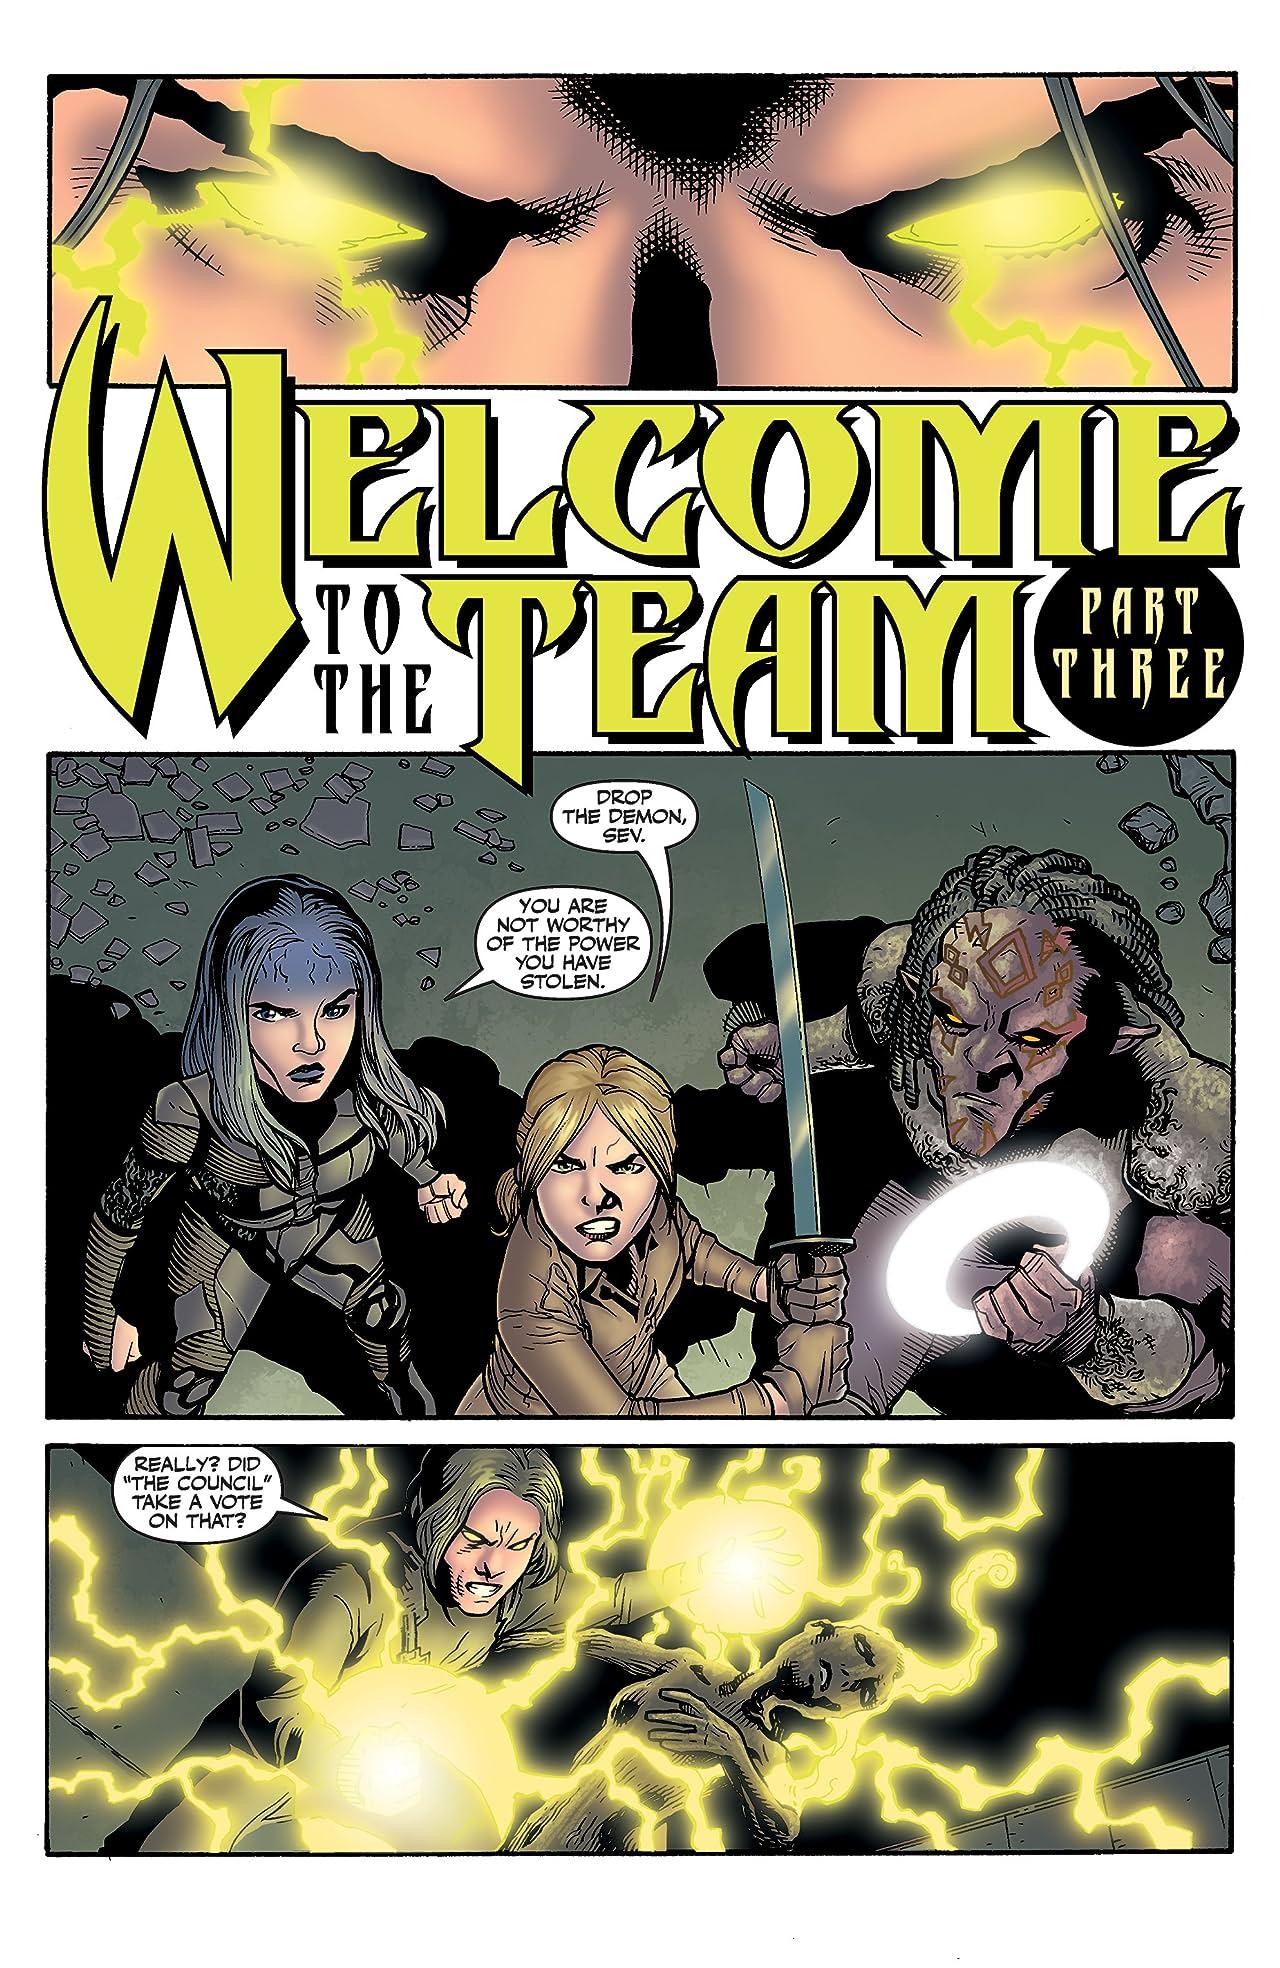 Buffy the Vampire Slayer: Season 9 #18